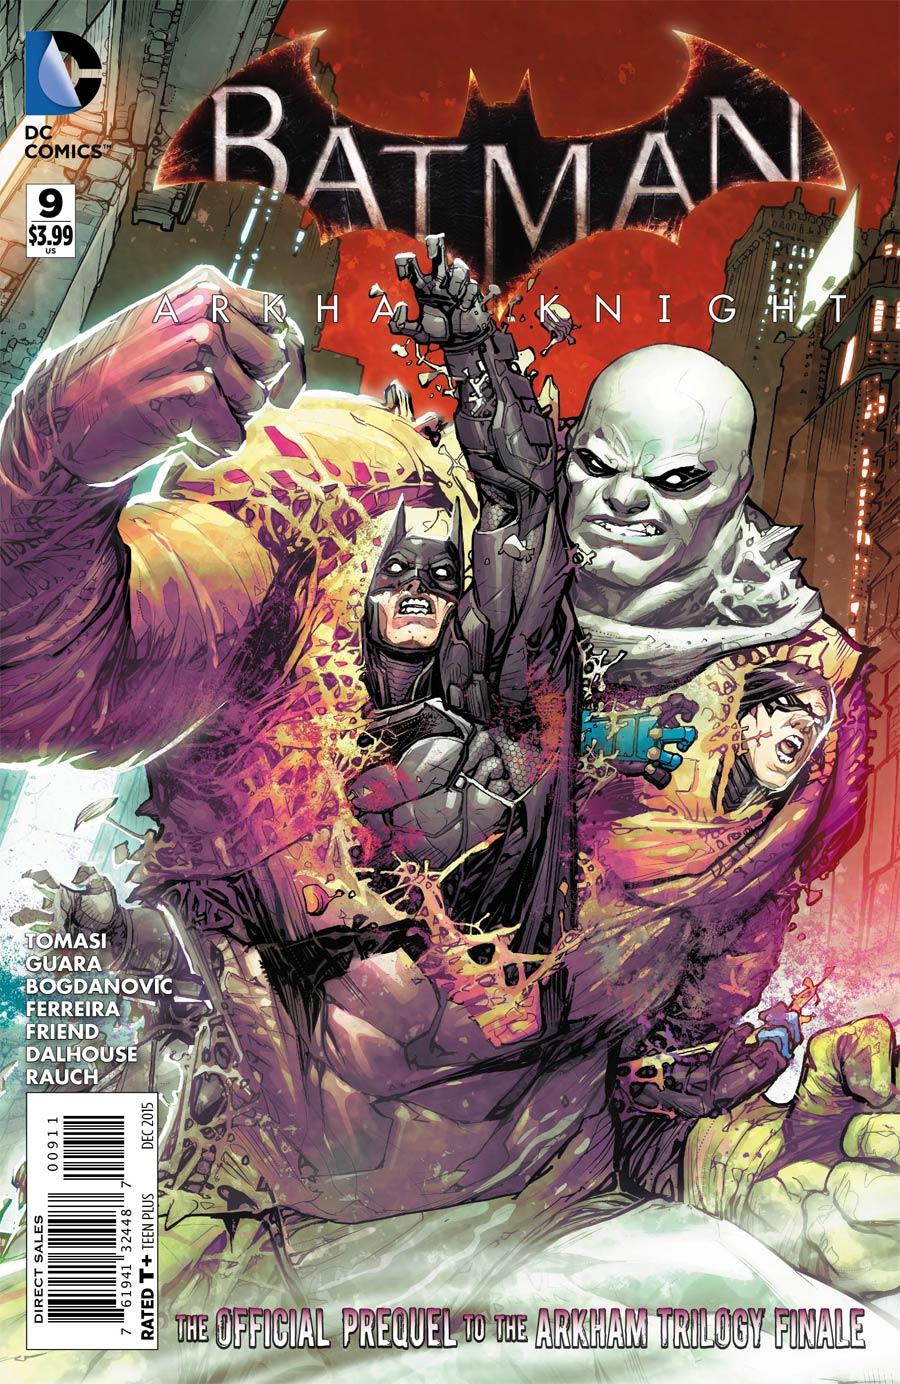 Batman Arkham Knight #9